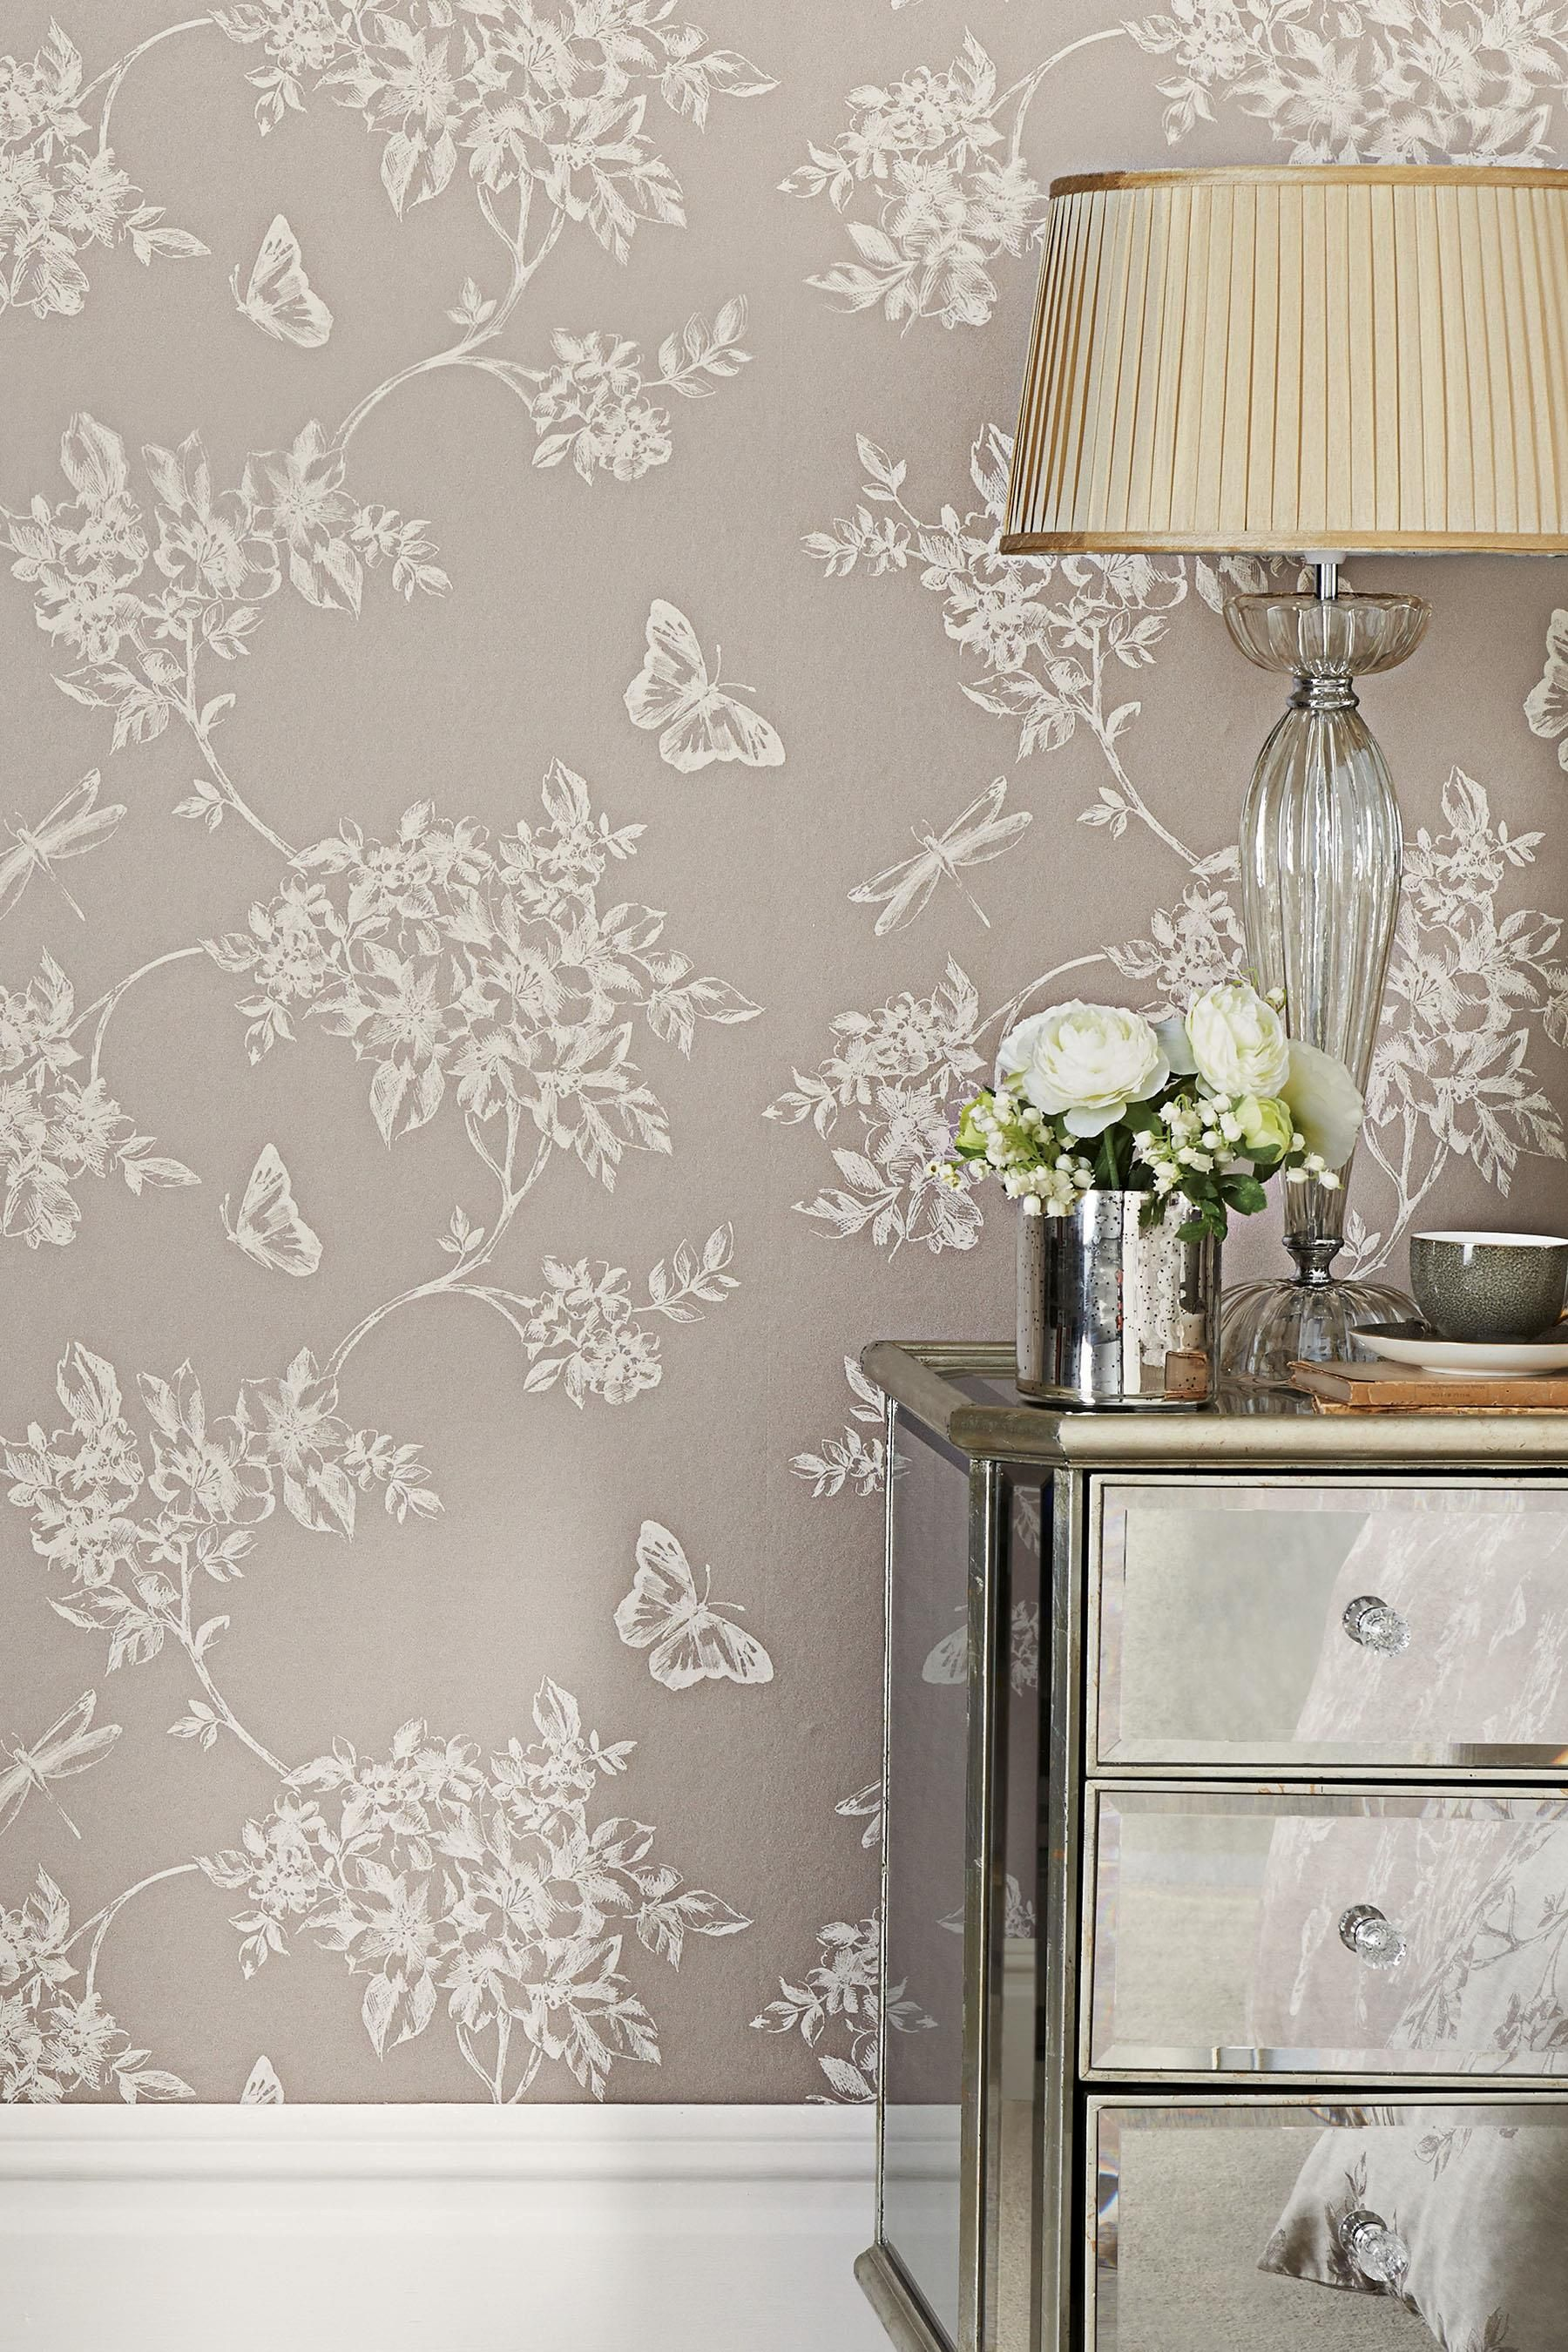 Love this Next wallpaper | Wallpapers | Pinterest | Wallpaper, Bedroom and Room wallpaper